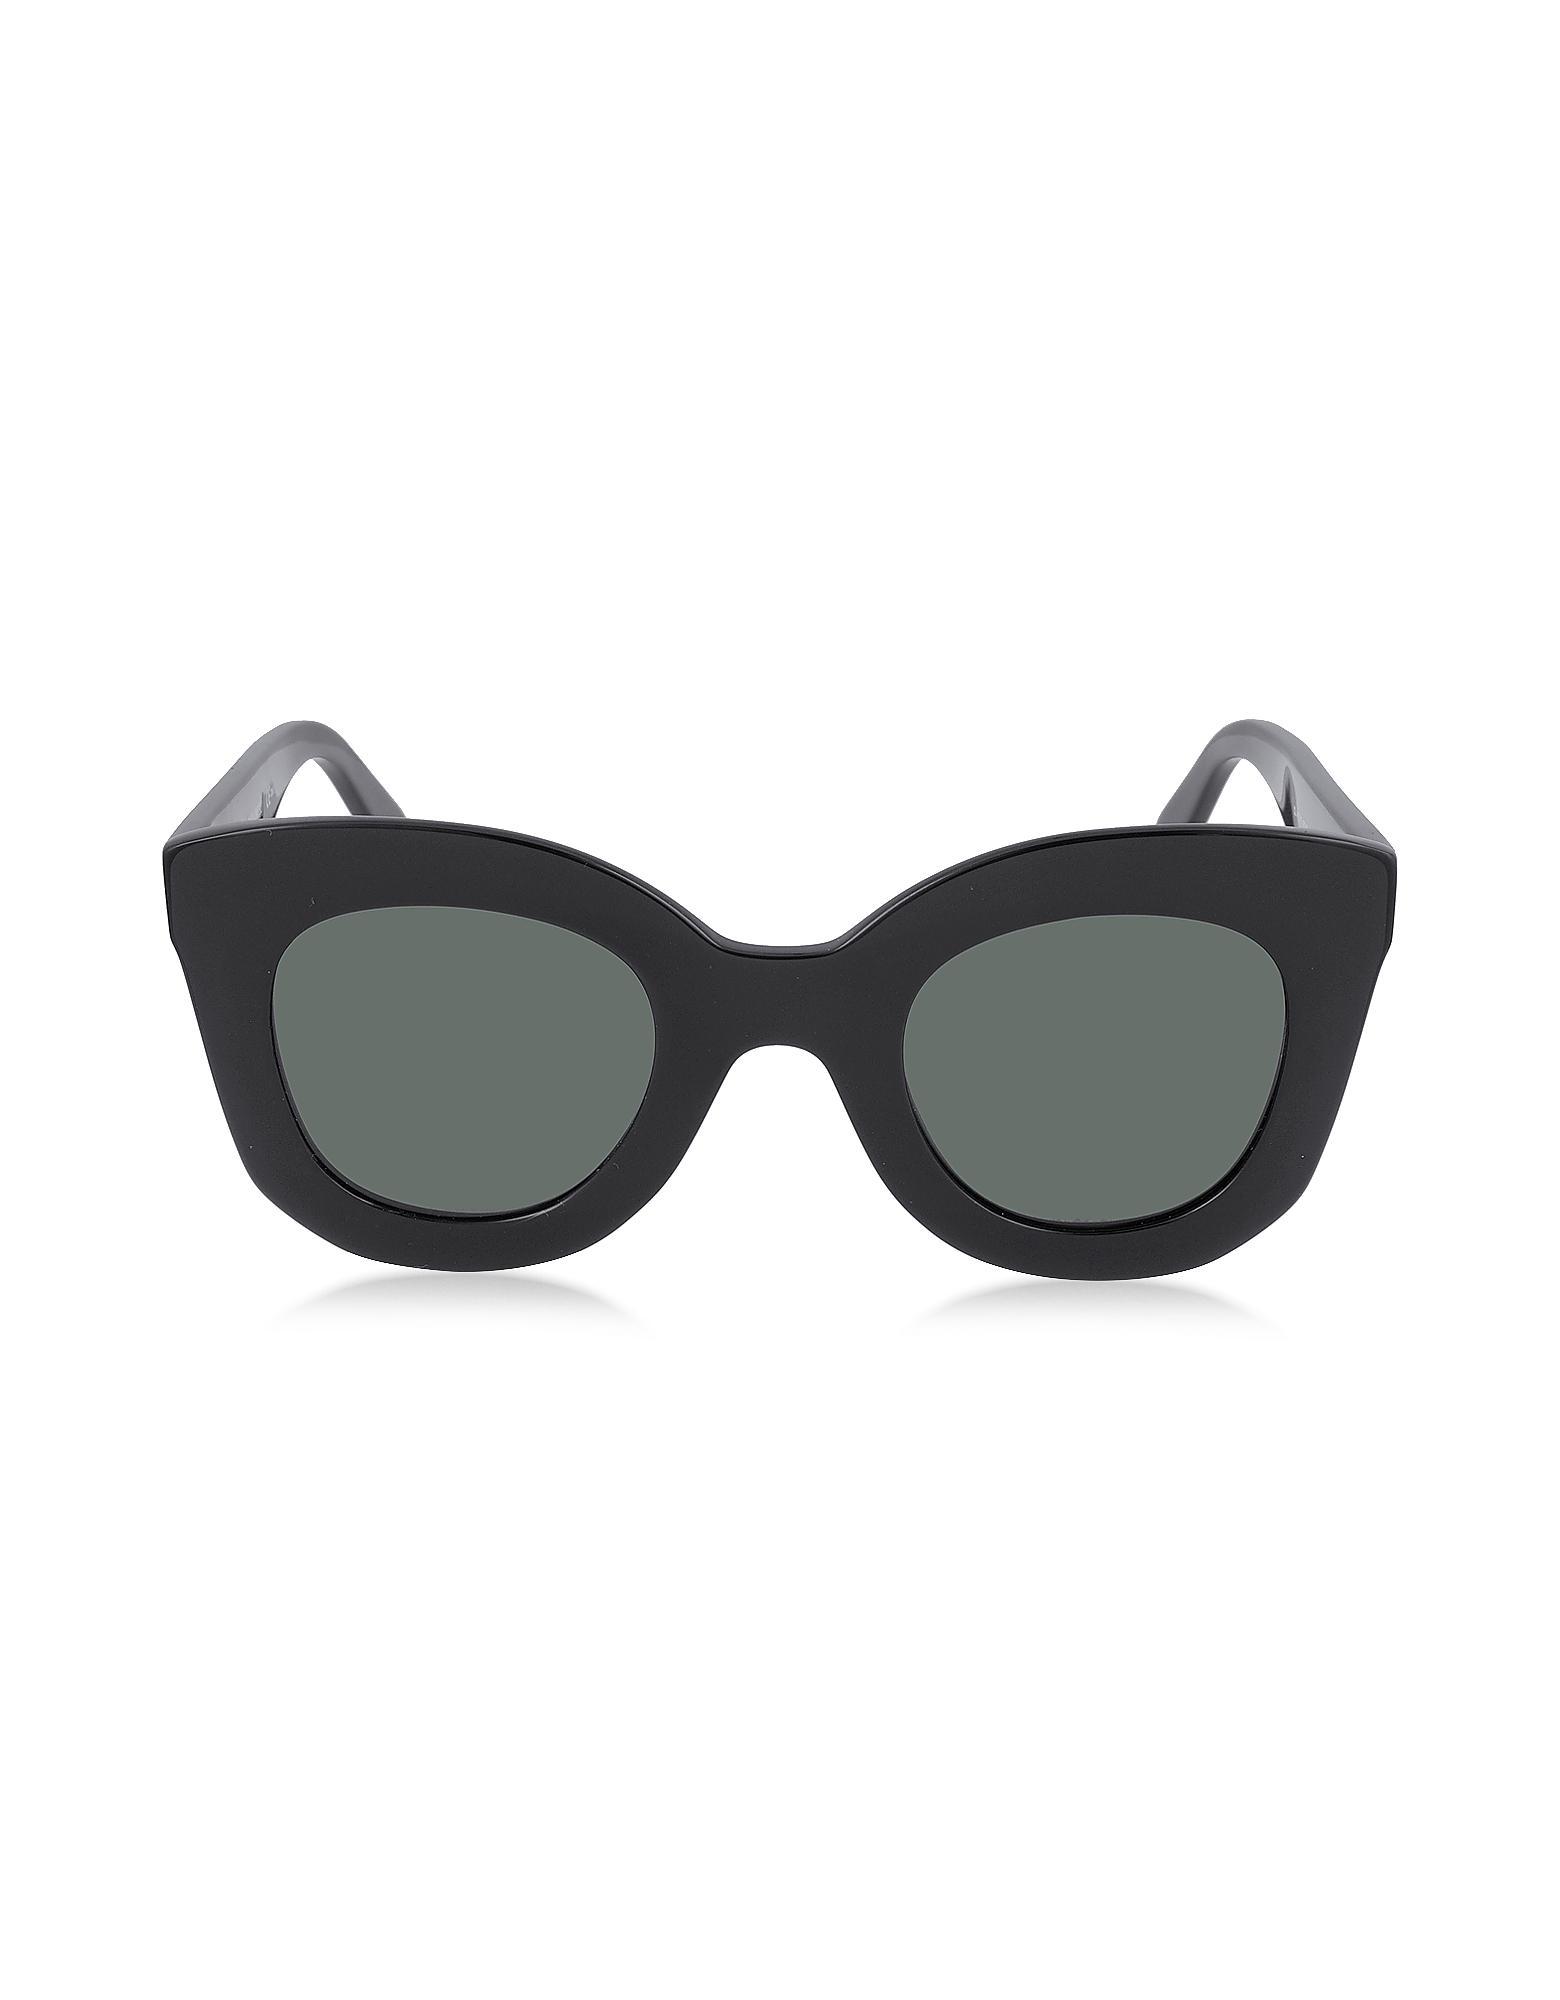 b75515cf251 Lyst - Céline Marta Cl 41093 s Acetate Cat Eye Women s Sunglasses in ...